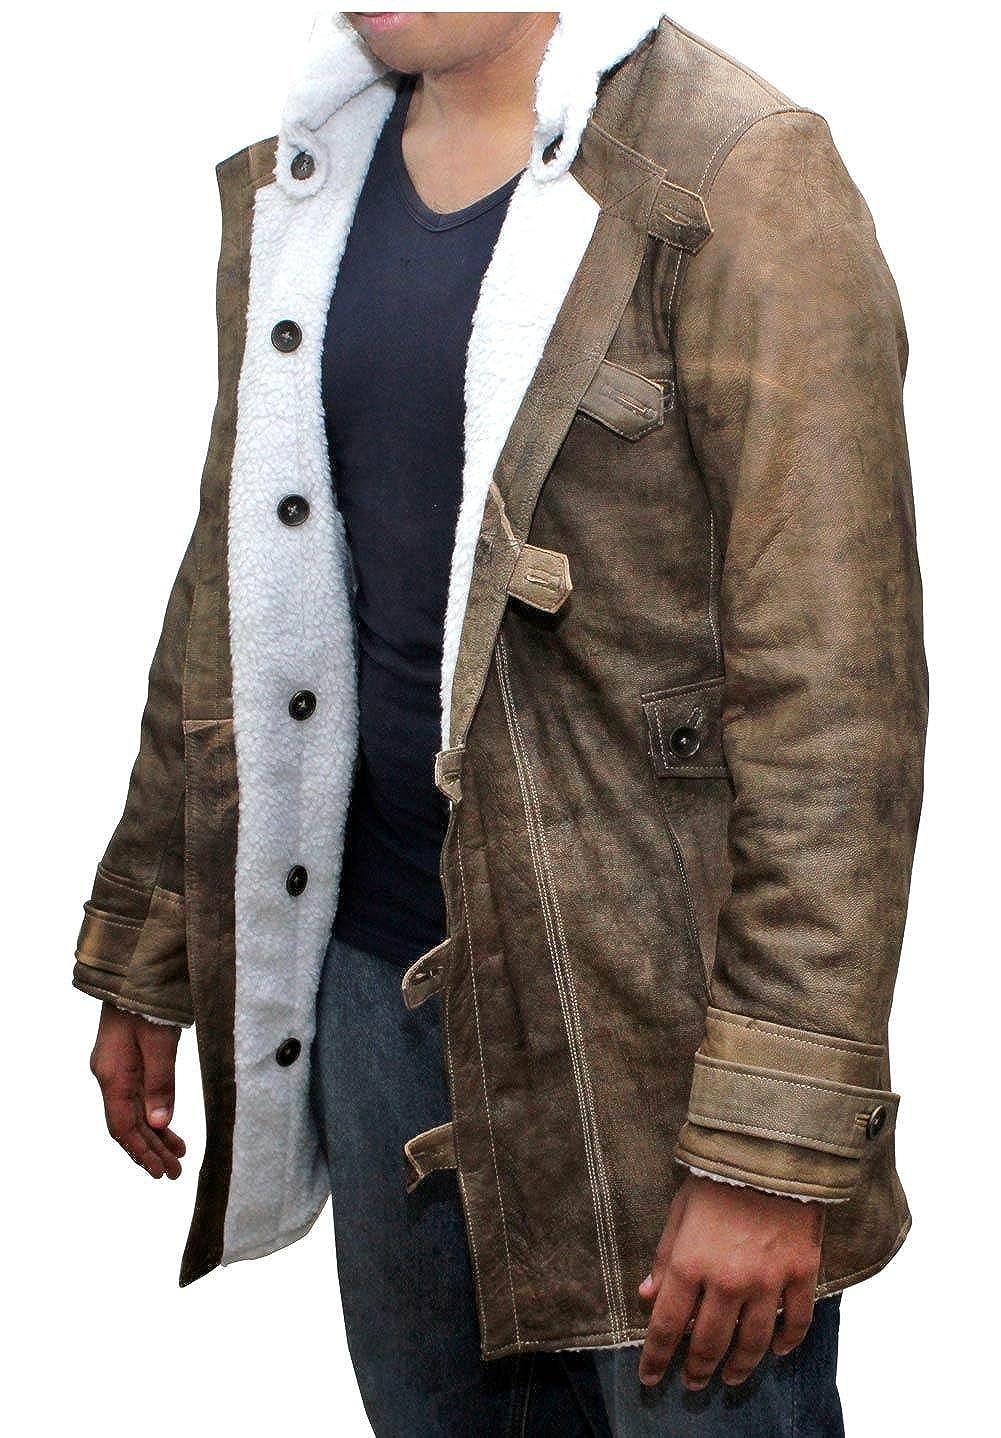 Genuine Swedish Mens Bomber Jacket - Shearling Leather Winter Jacket Coat for Men